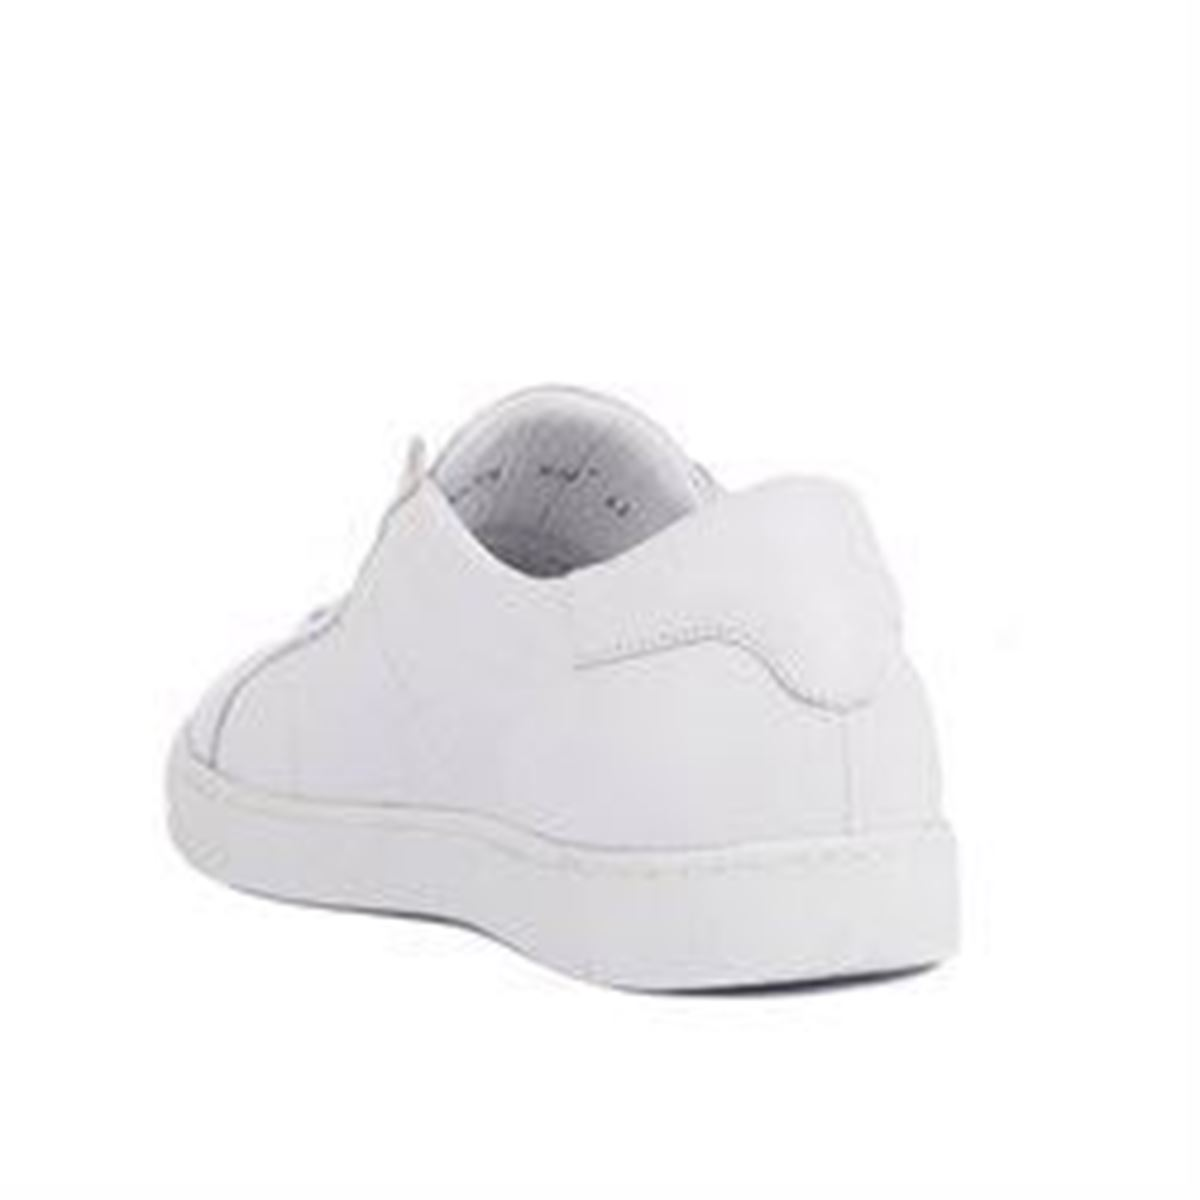 صورة Sail Lakers - Beyaz Renk Deri Erkek Günlük Ayakkabı